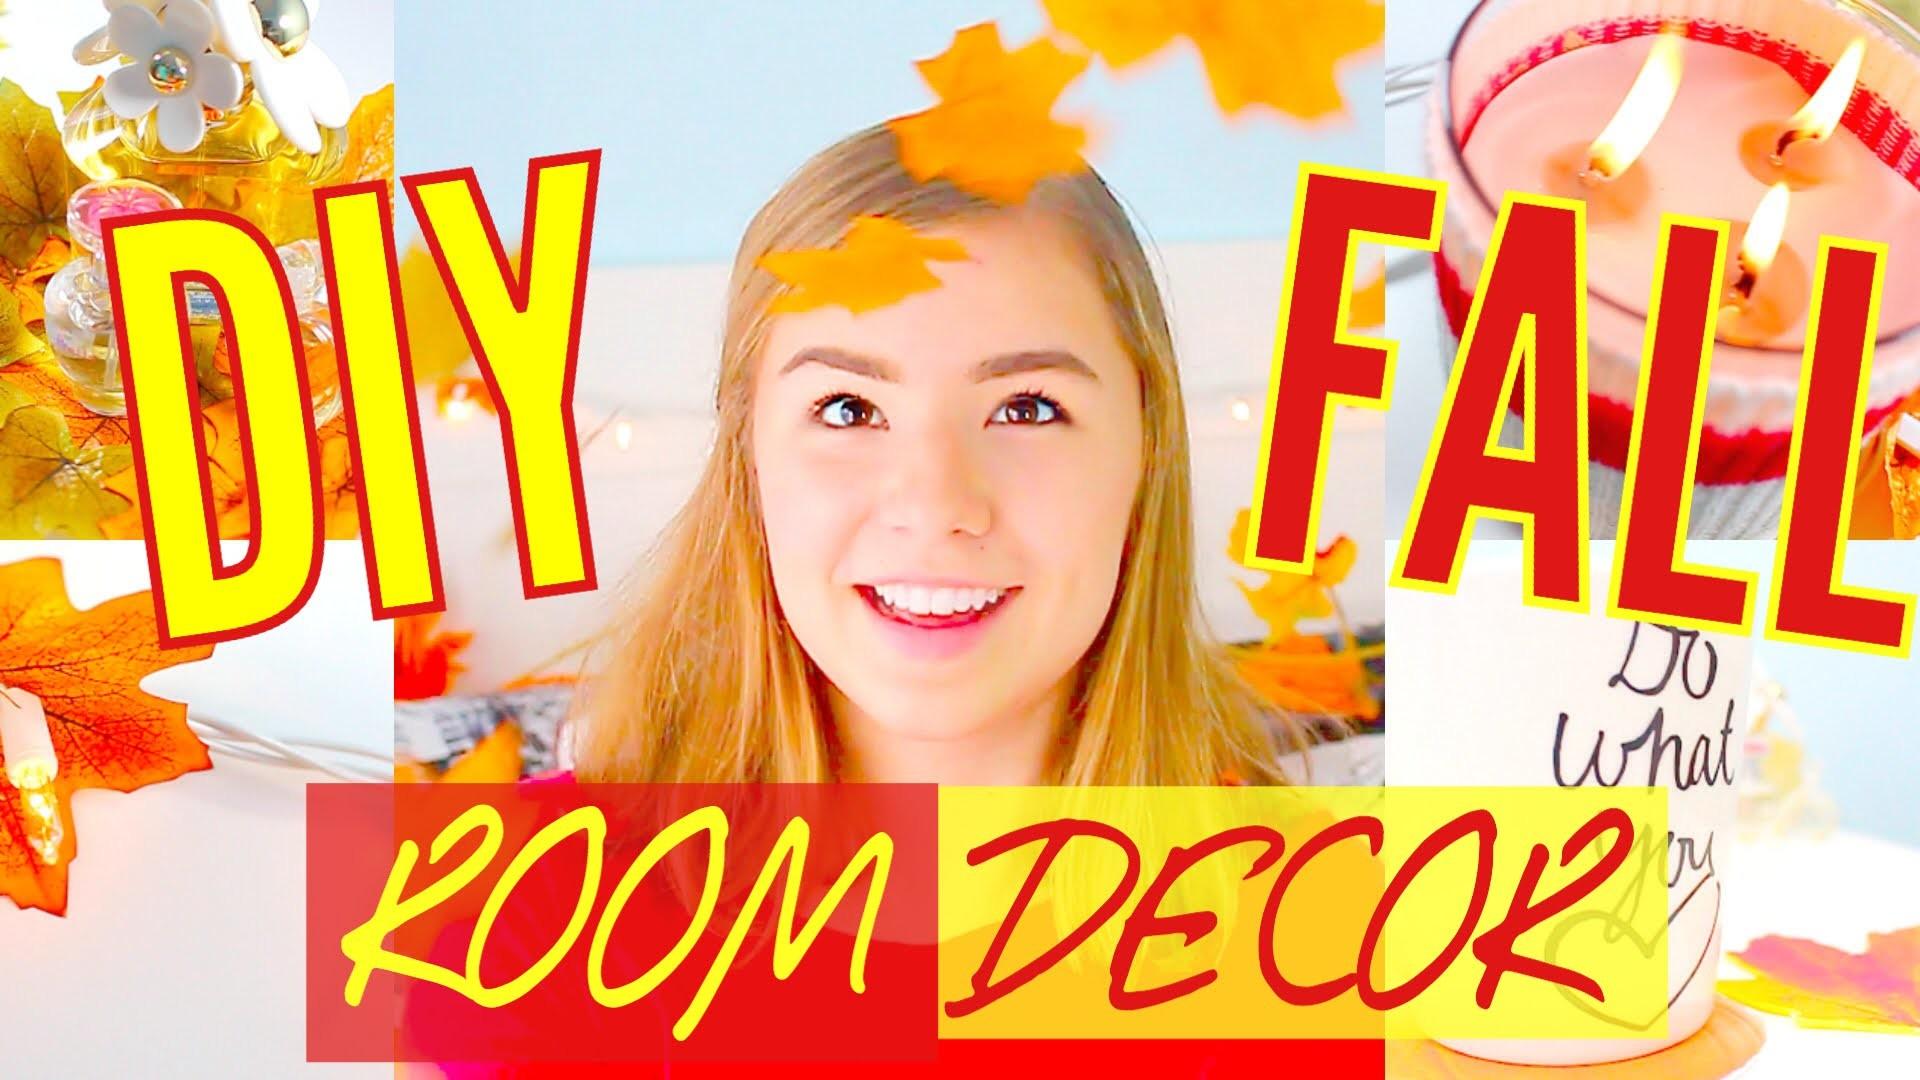 DIY Cozy Fall Room Decor for Cheap! Tumblr Inspired